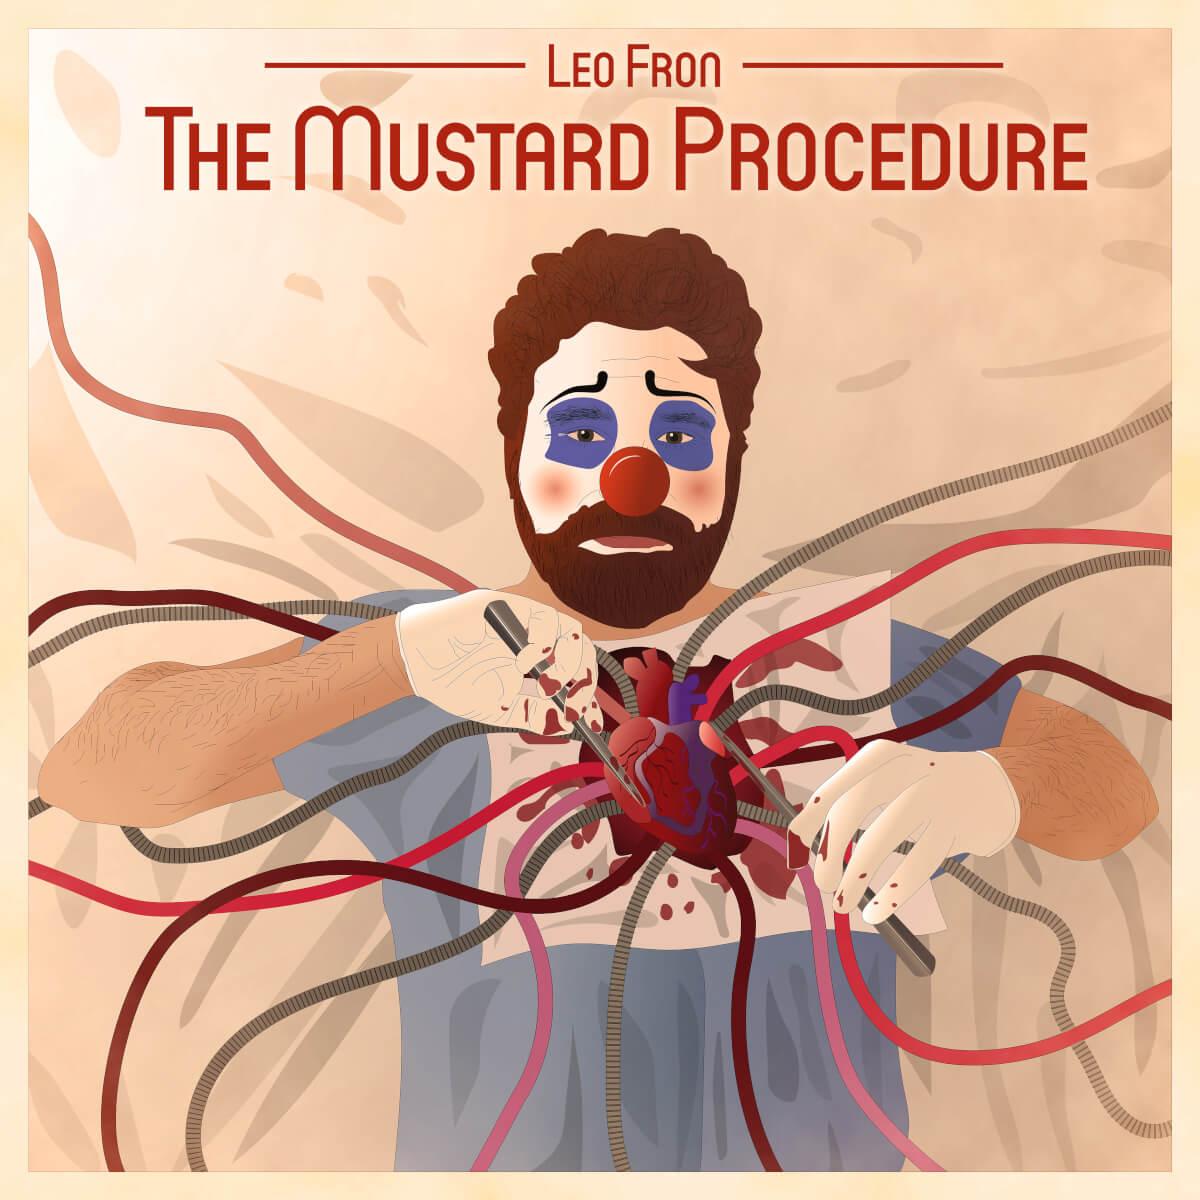 Leo Fron: The Mustard Procedure